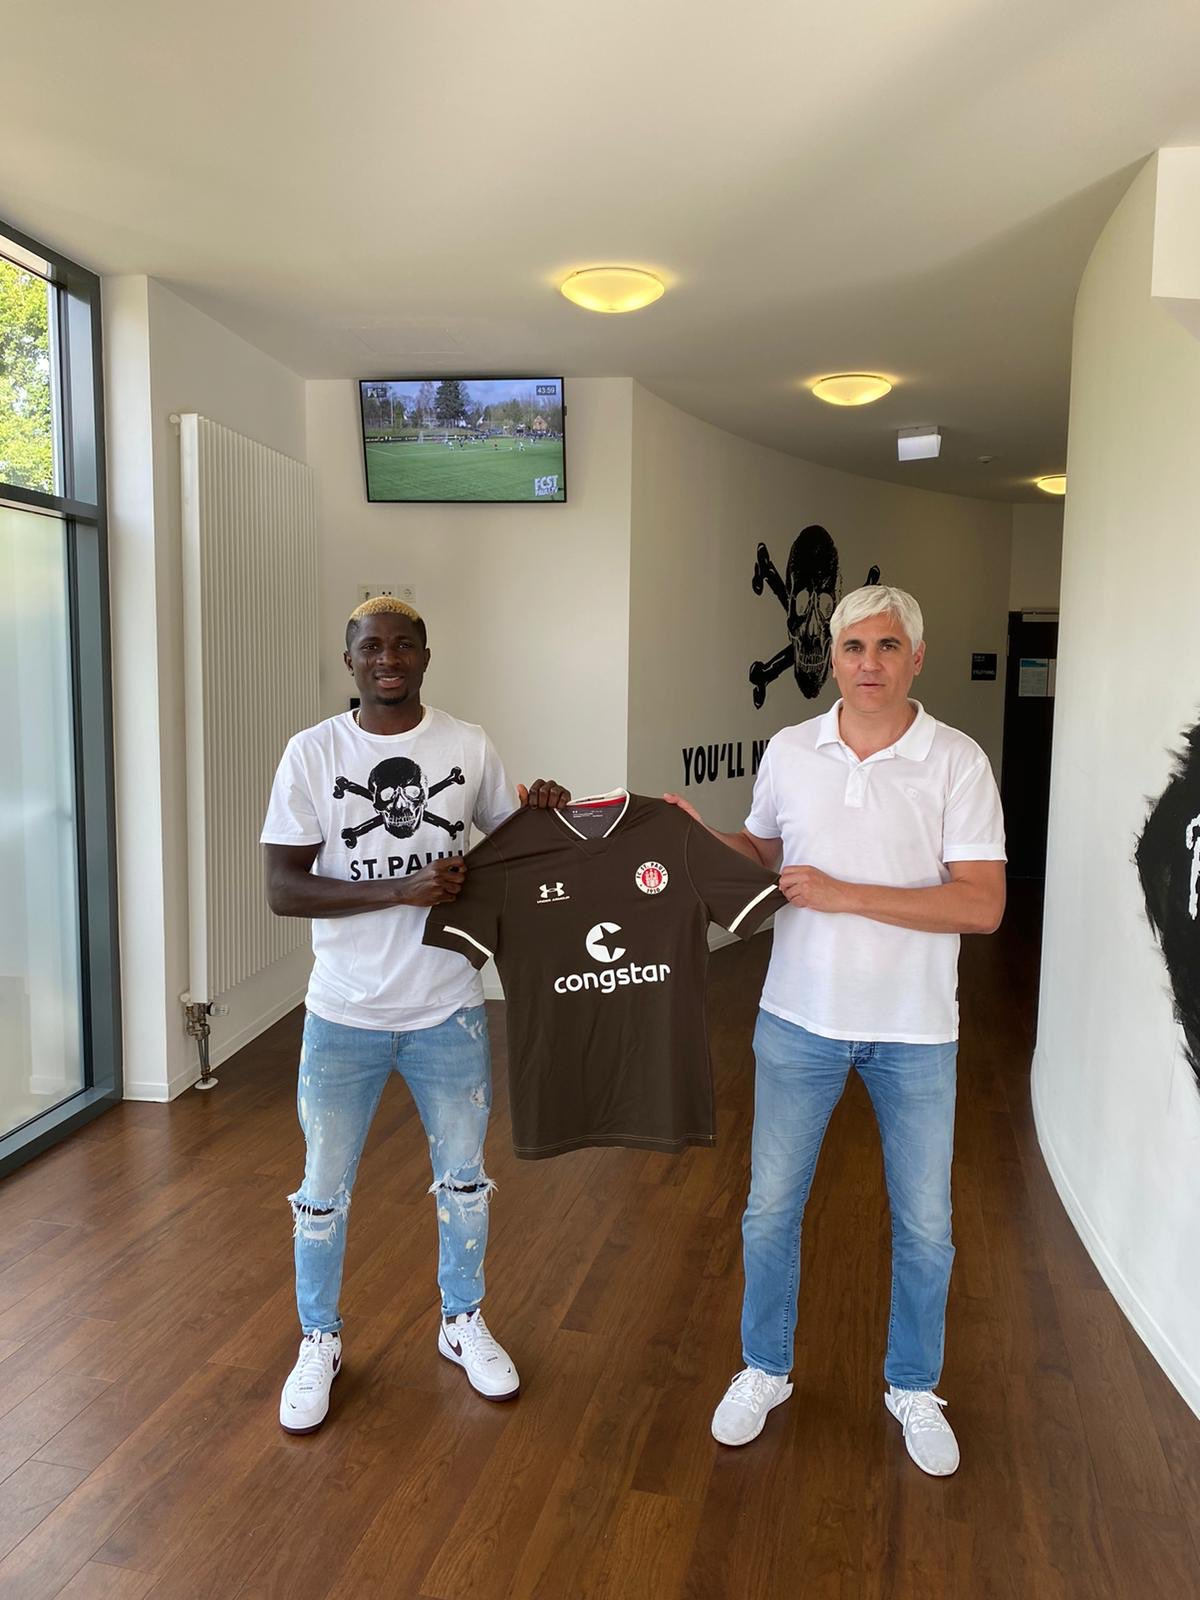 Ex-Flying Eagles Midfielder Aremu Joins German Club St. Pauli On Three-Year Contract